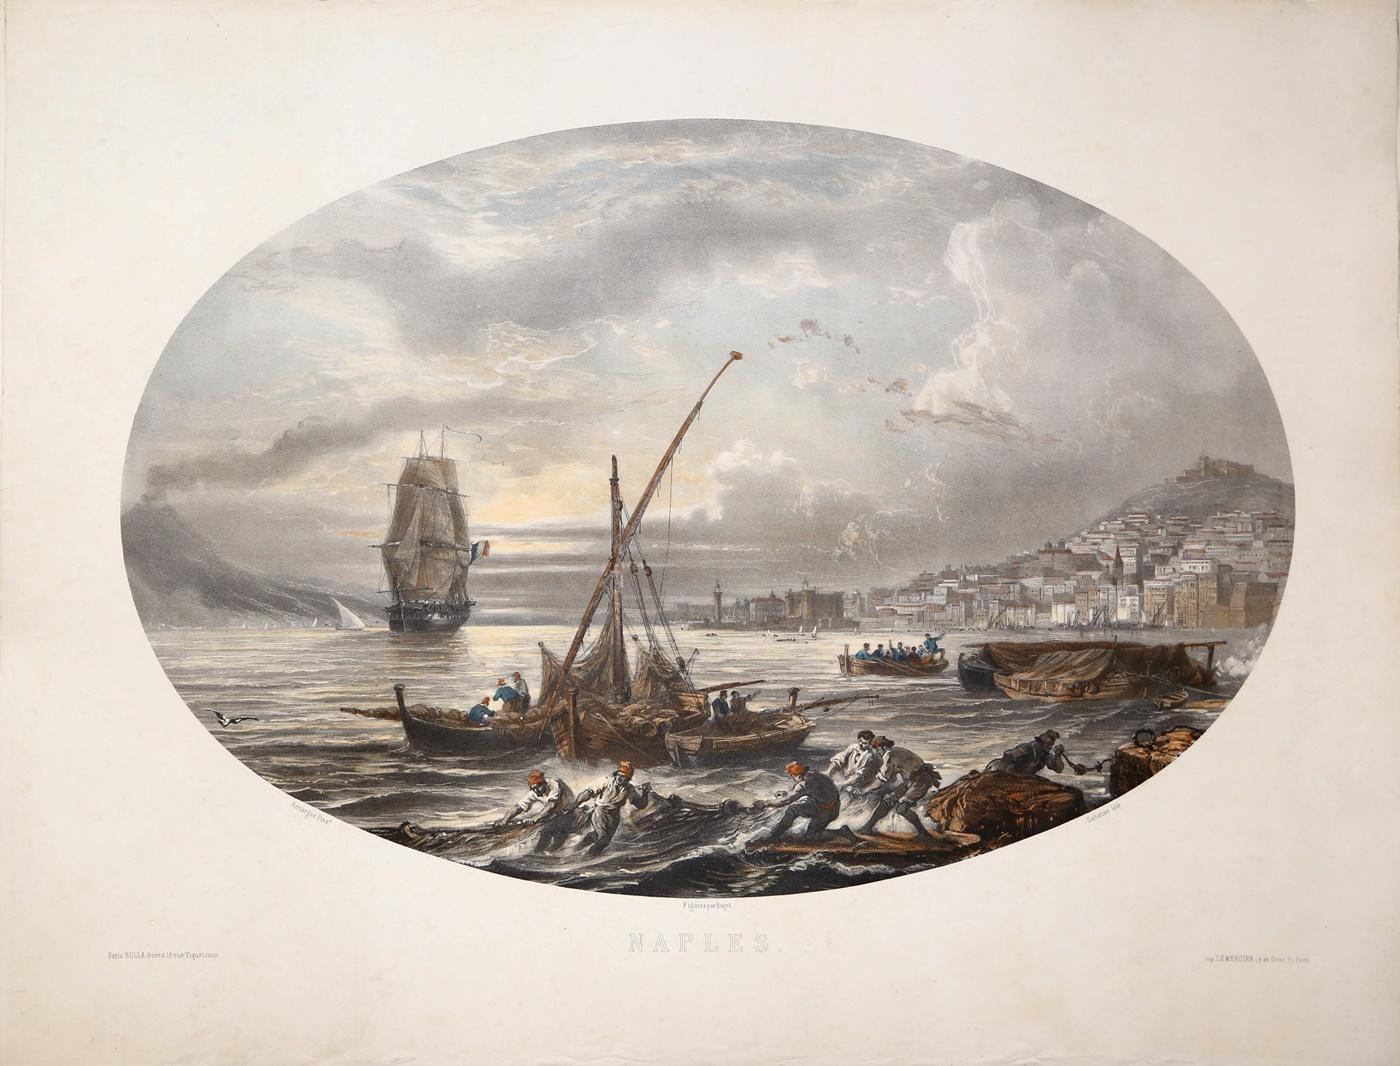 Naples-LEMERCIER-editore-Editore-Parigi-1870